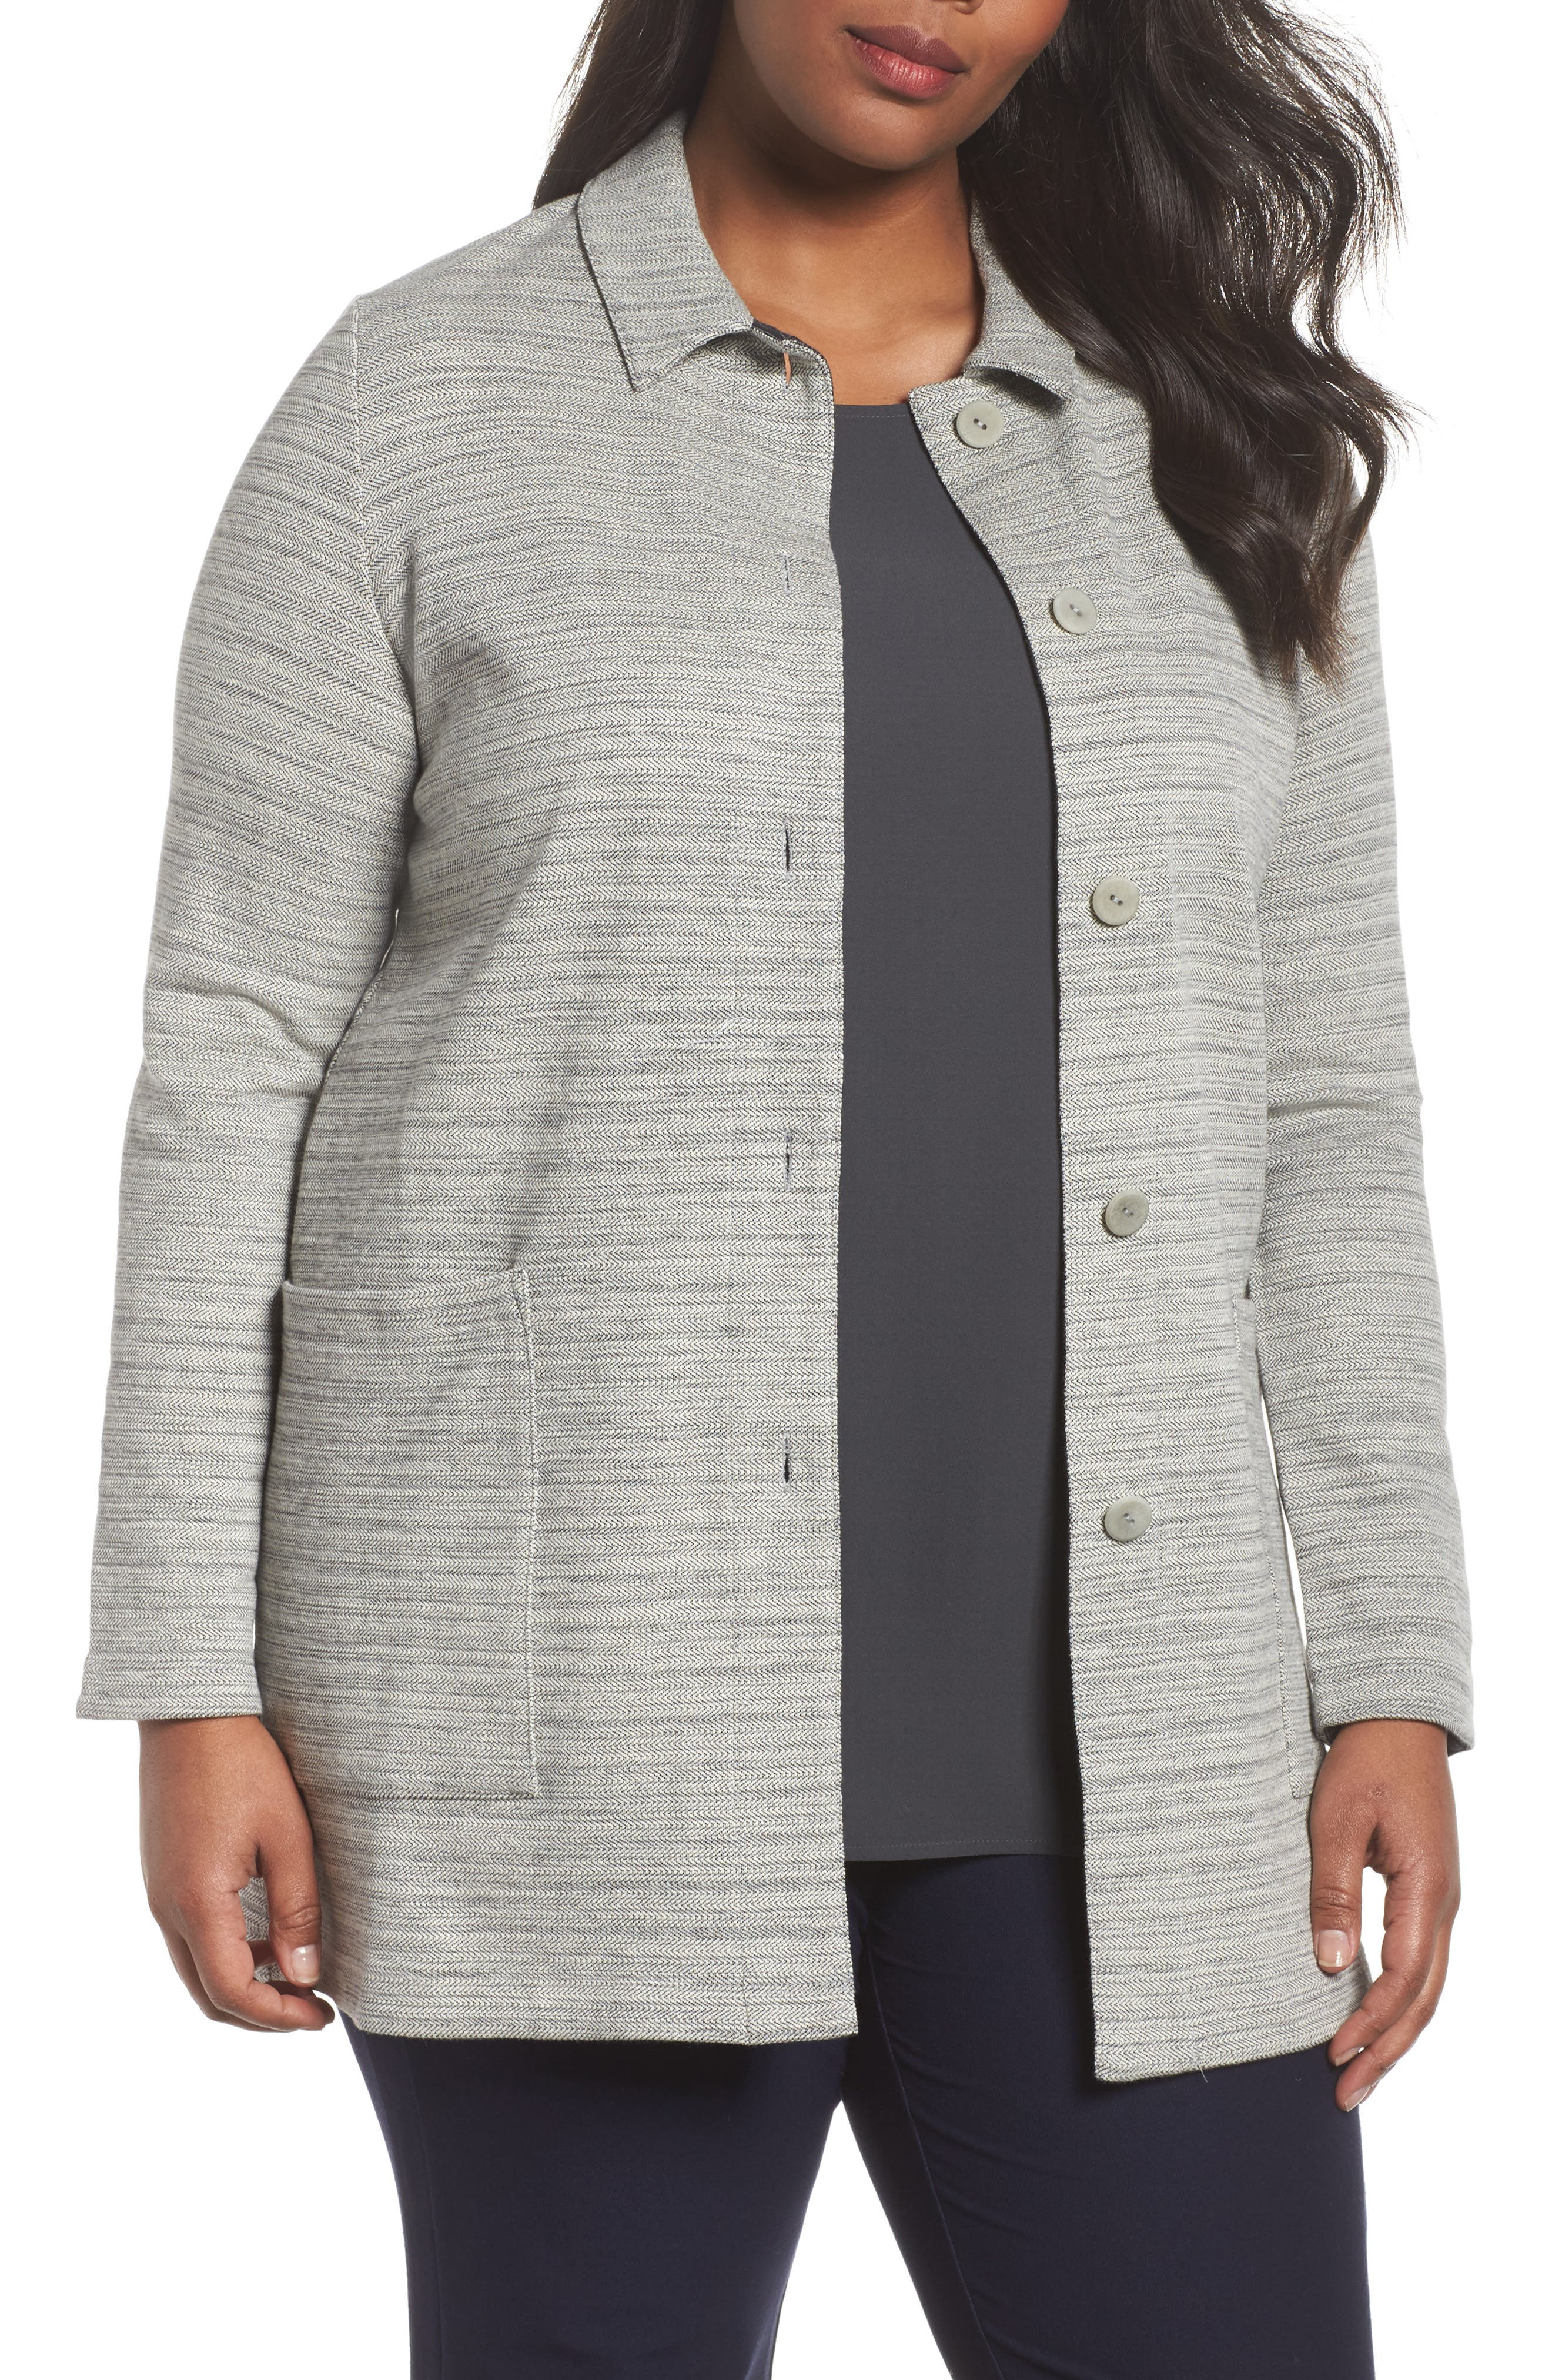 Cotton Blend Tweed Jacket,                             Main thumbnail 1, color,                             022